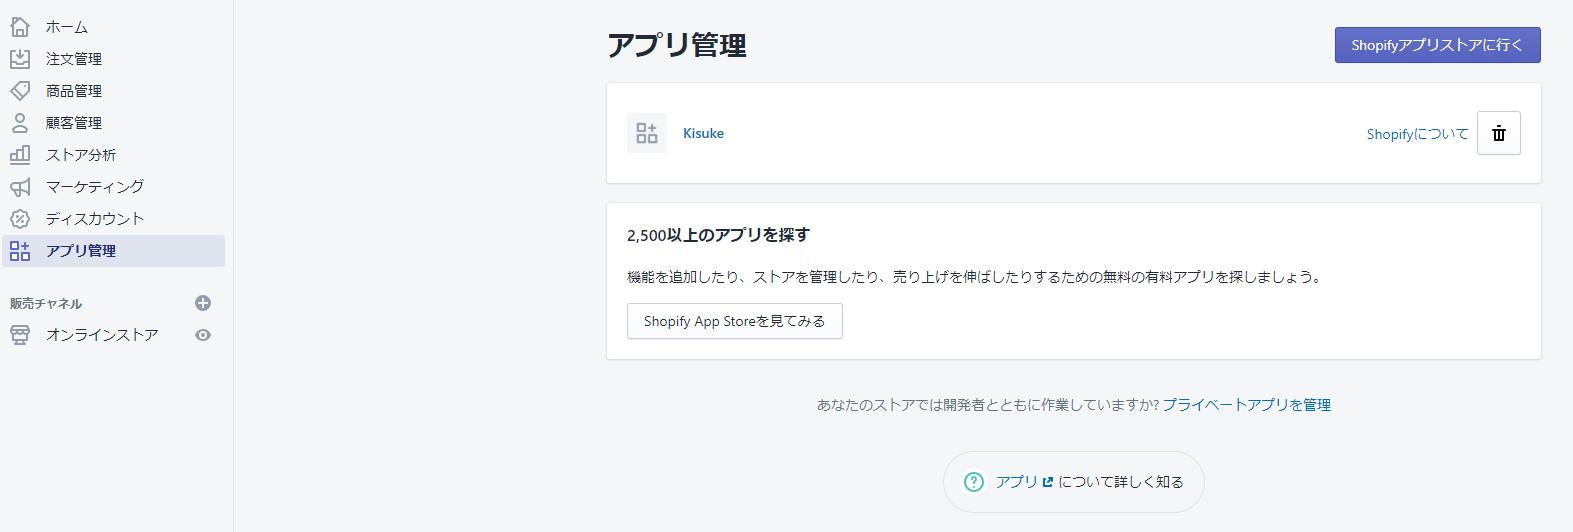 6_Facebookアプリ管理